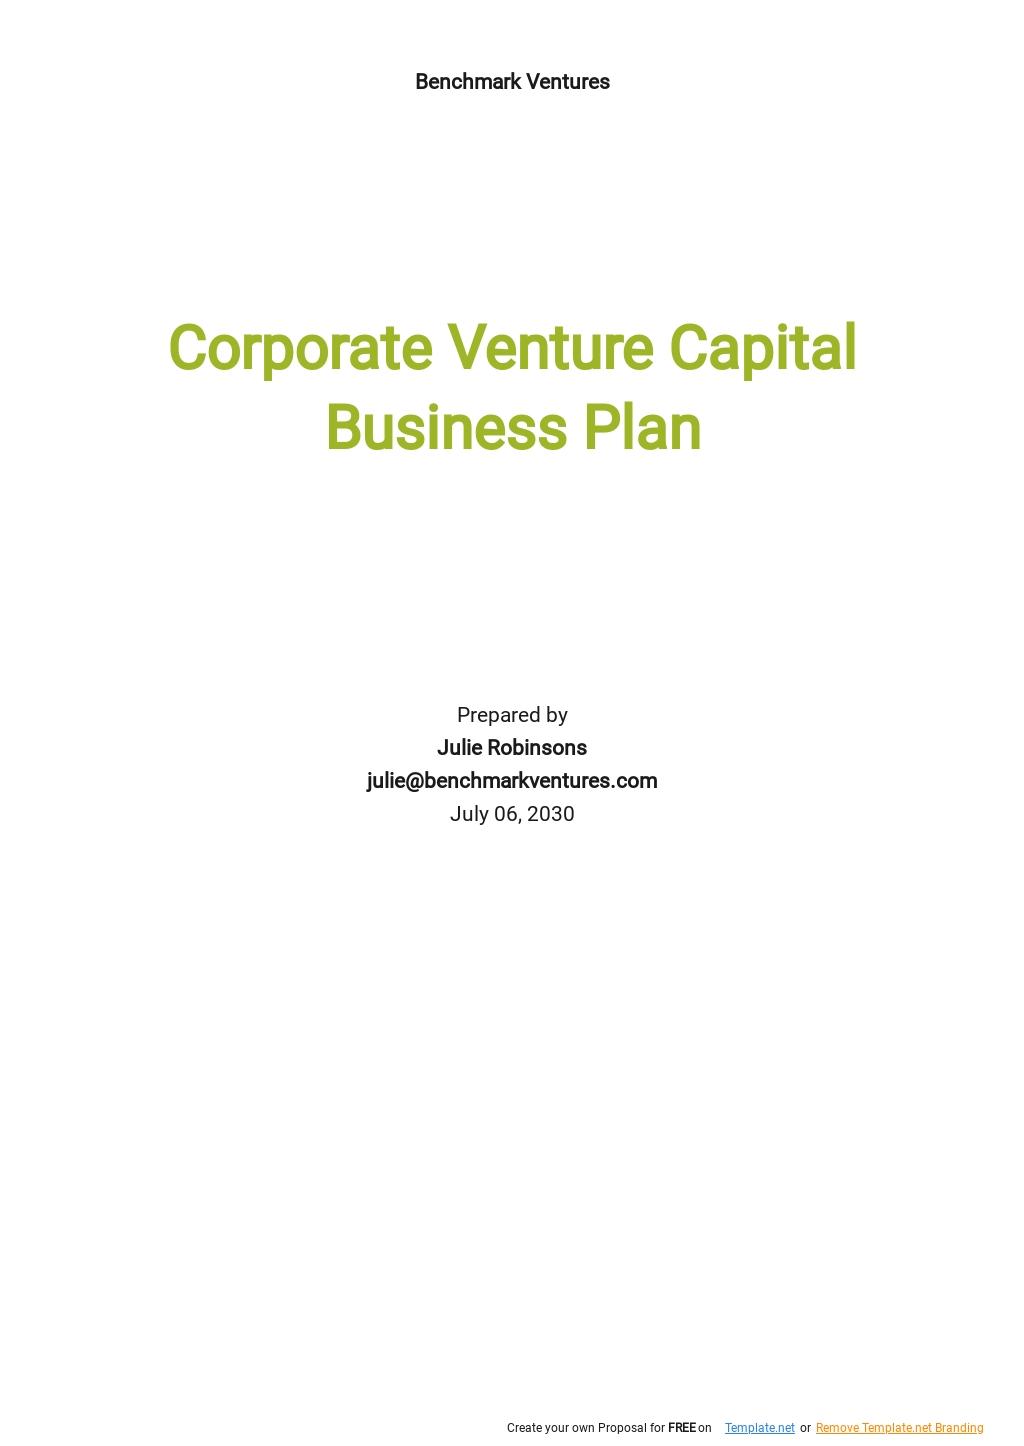 Venture Capital Business Plan Template.jpe